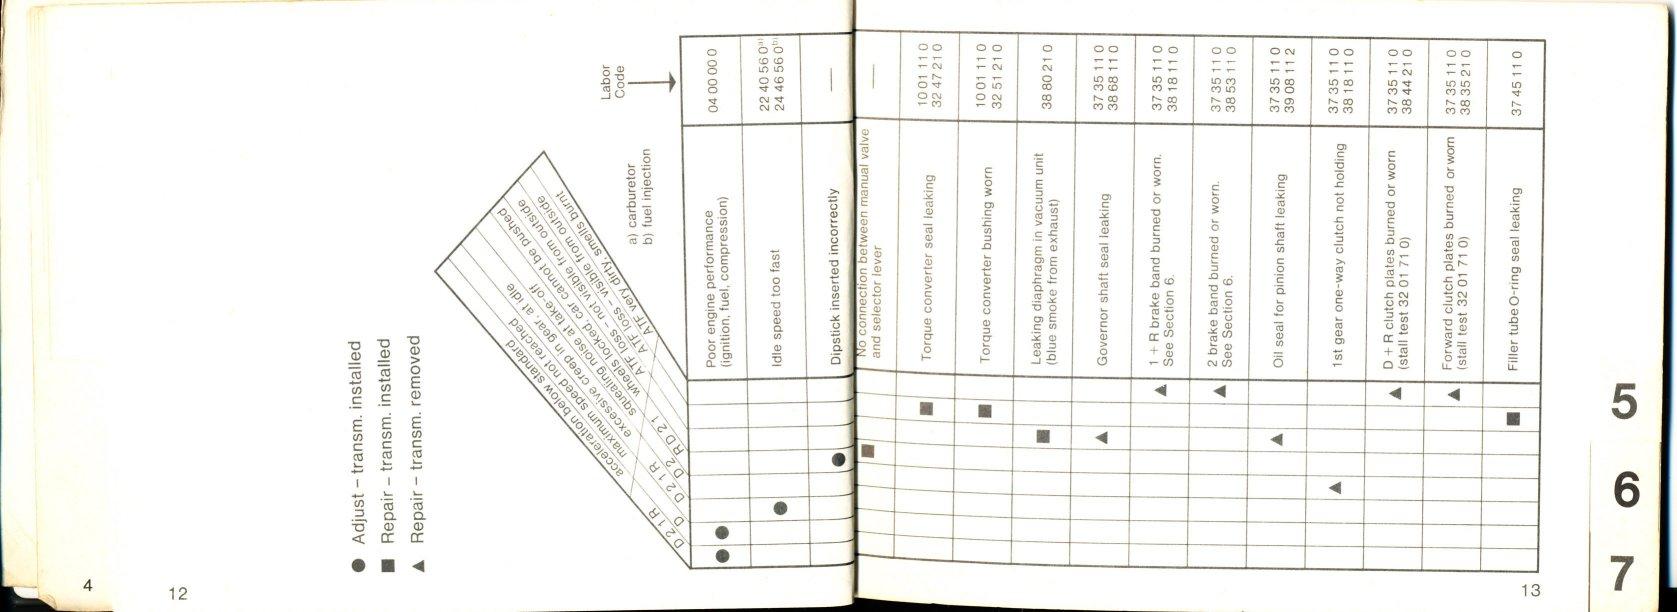 TheSamba.com :: 1973 VW Automatic Transmission Troubleshooting